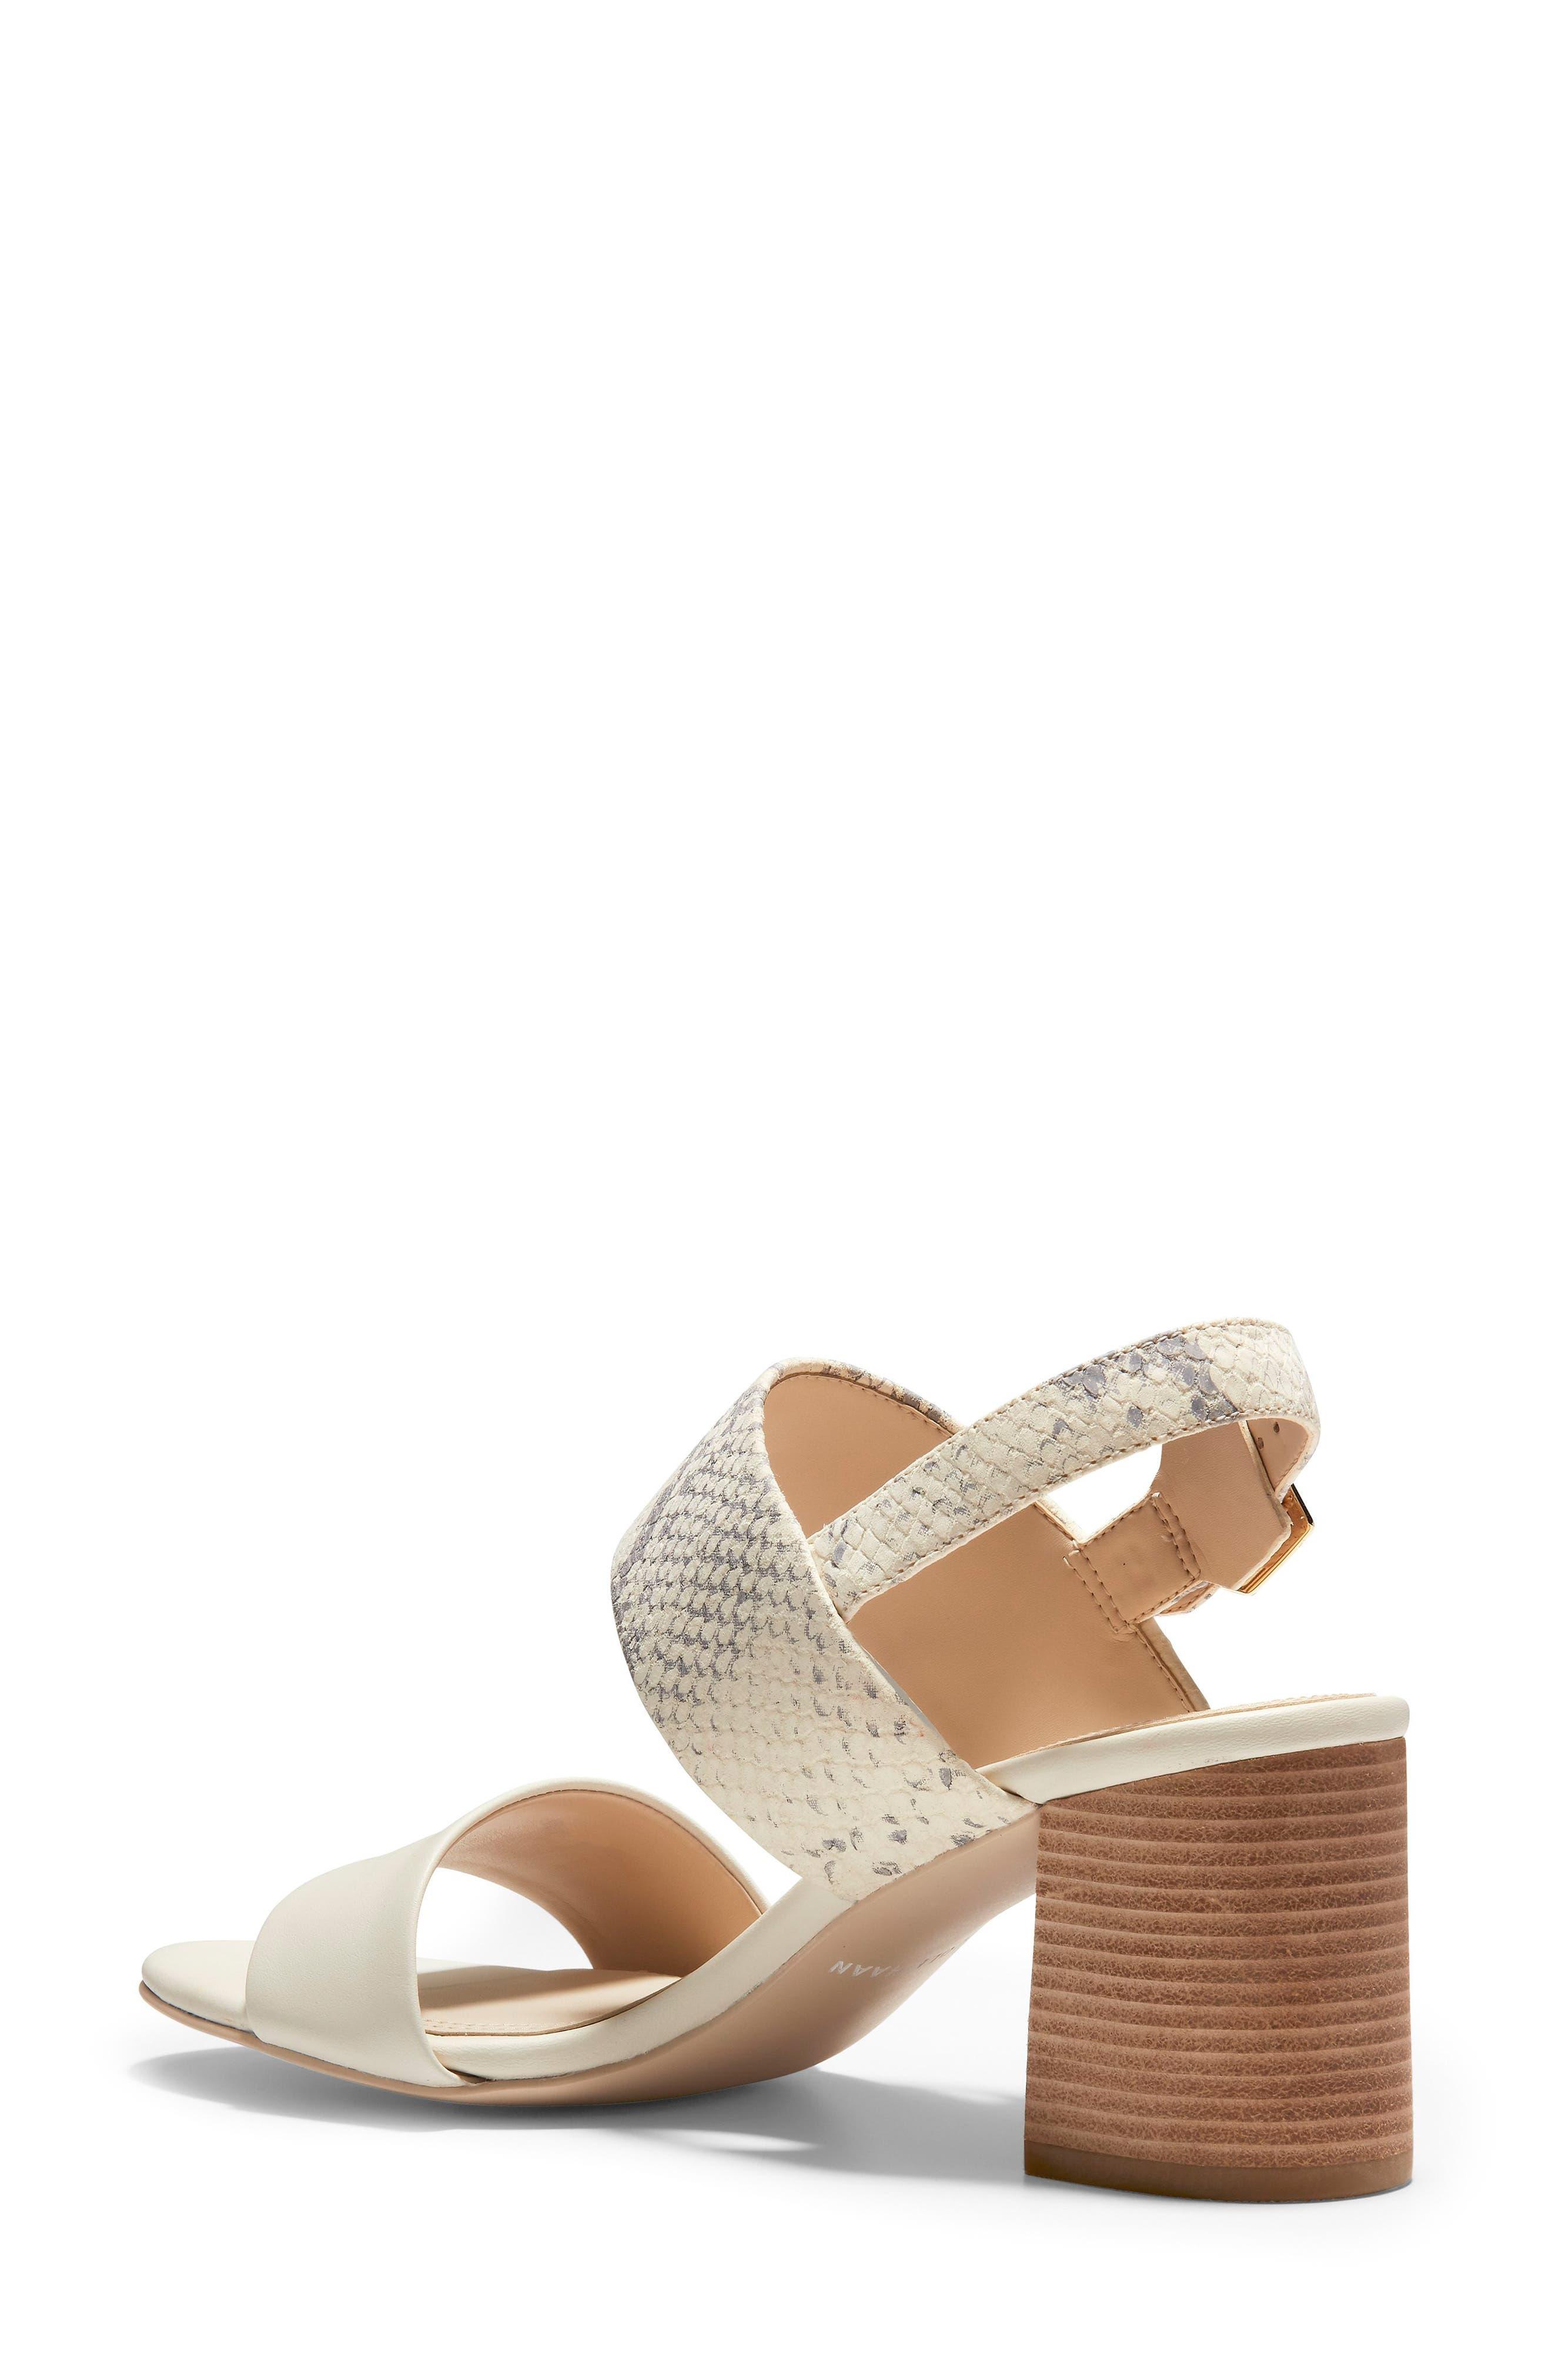 COLE HAAN, Avani Block Heel Sandal, Alternate thumbnail 2, color, IVORY PRINT LEATHER